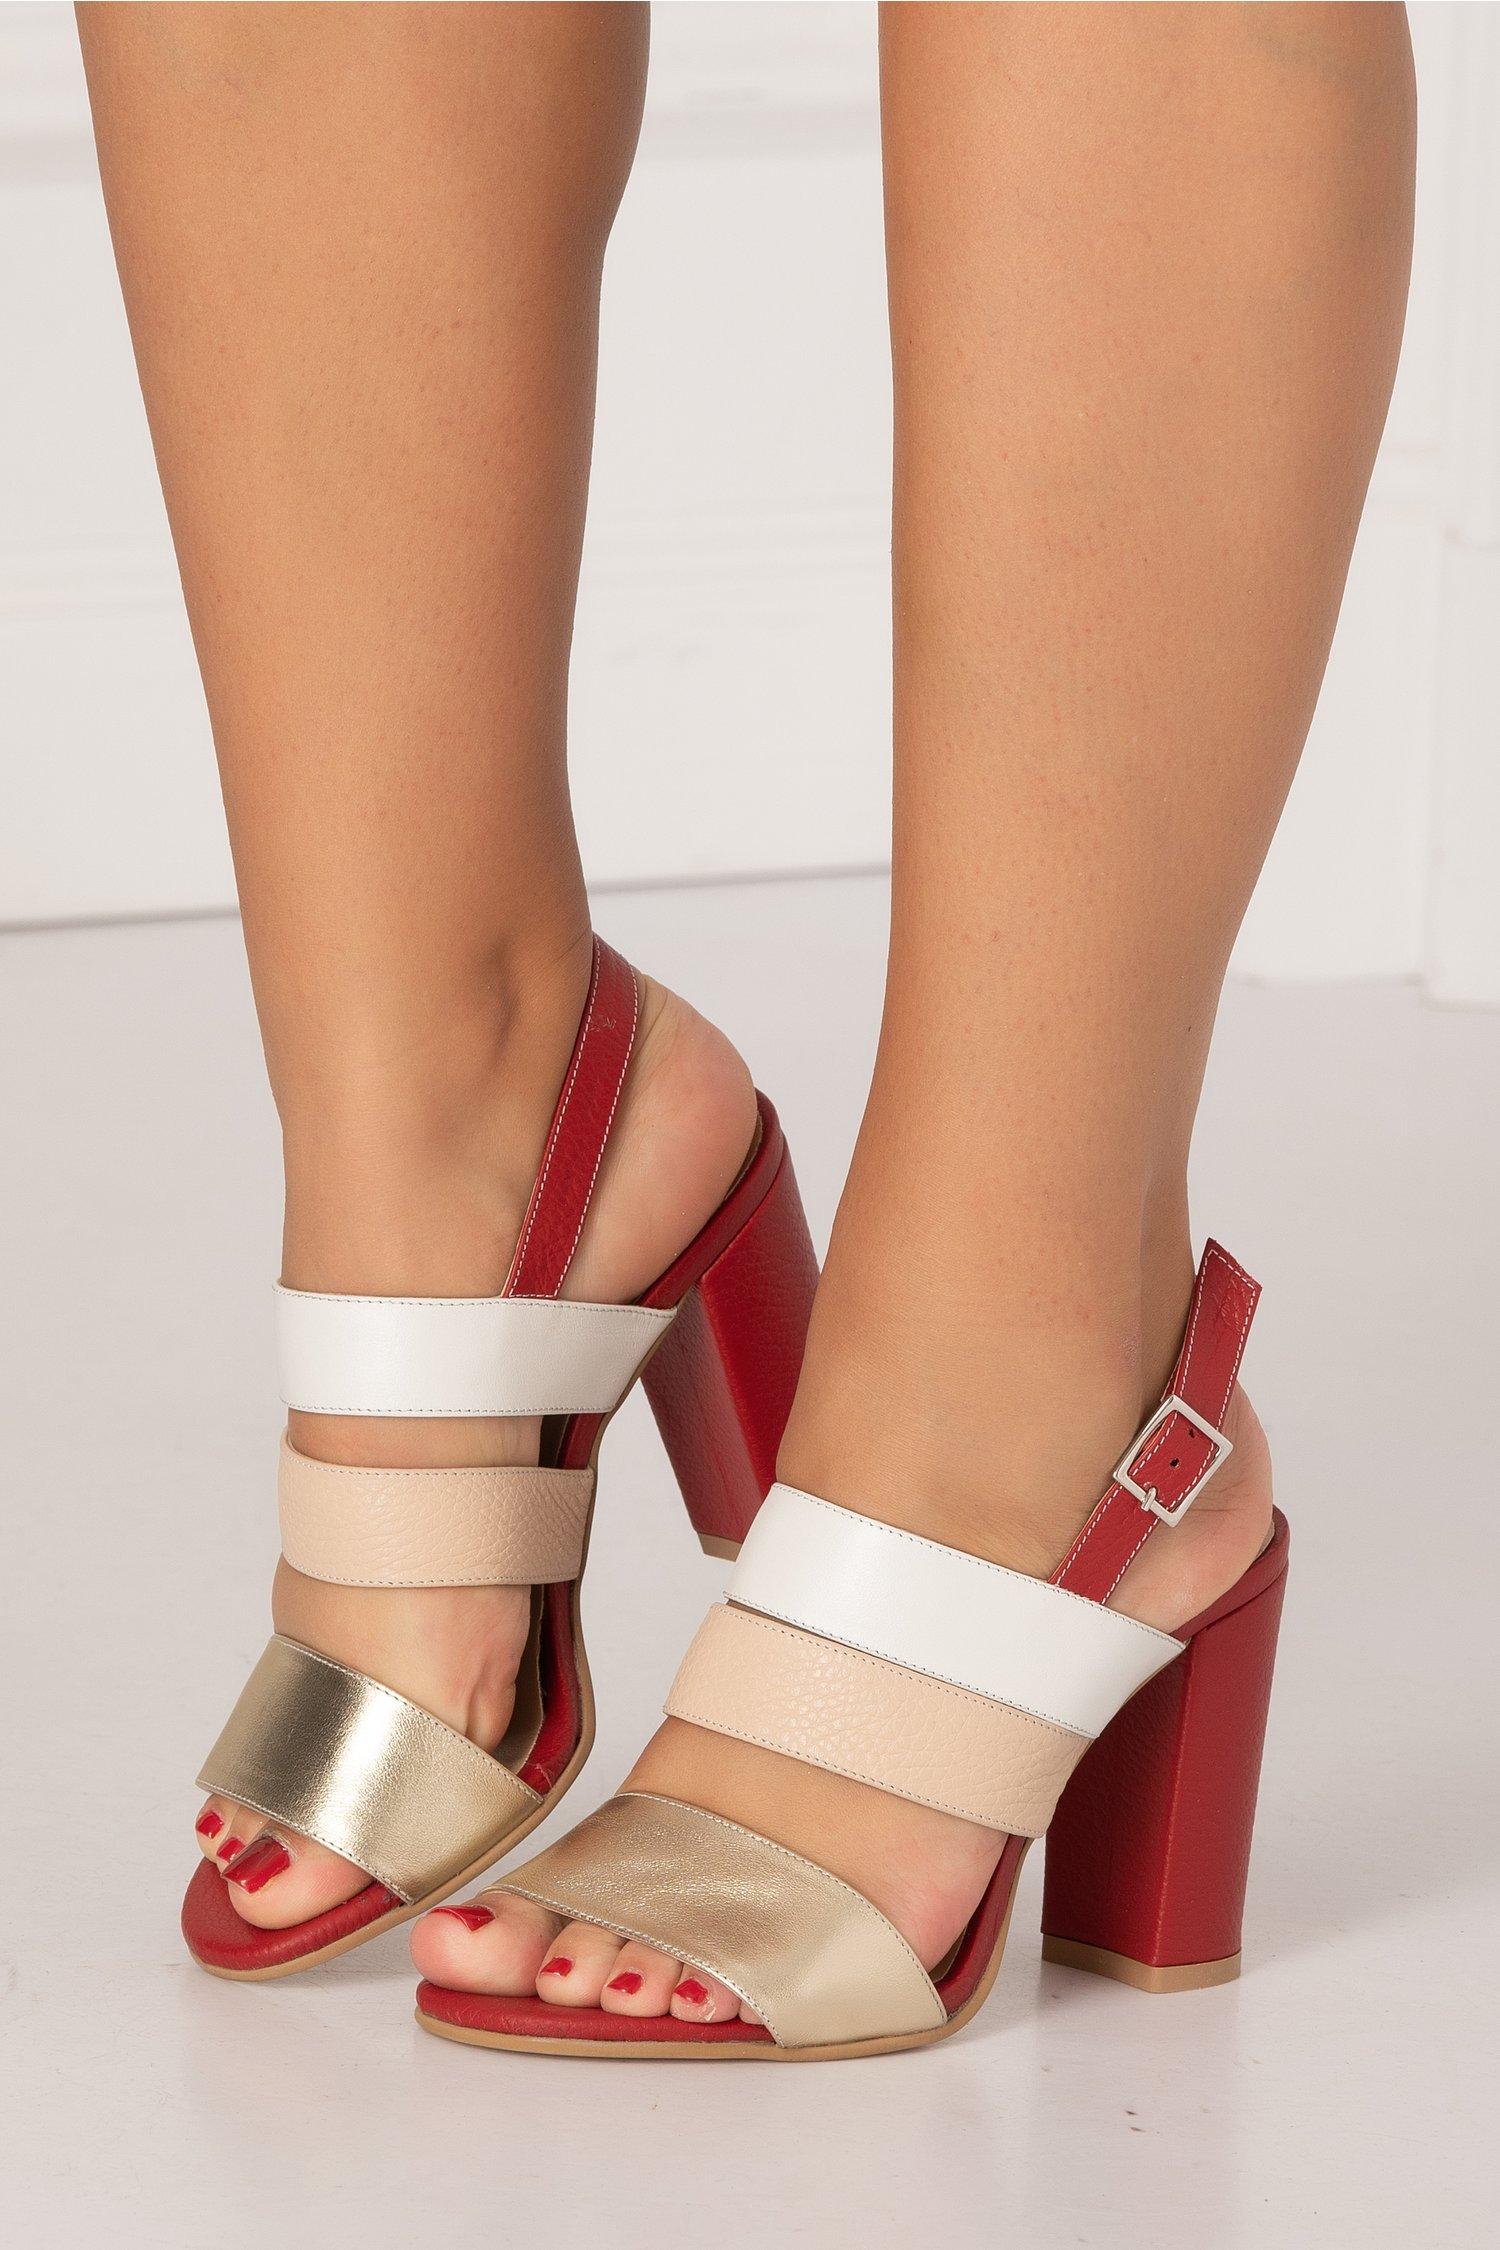 Sandale rosii cu bareta aurie